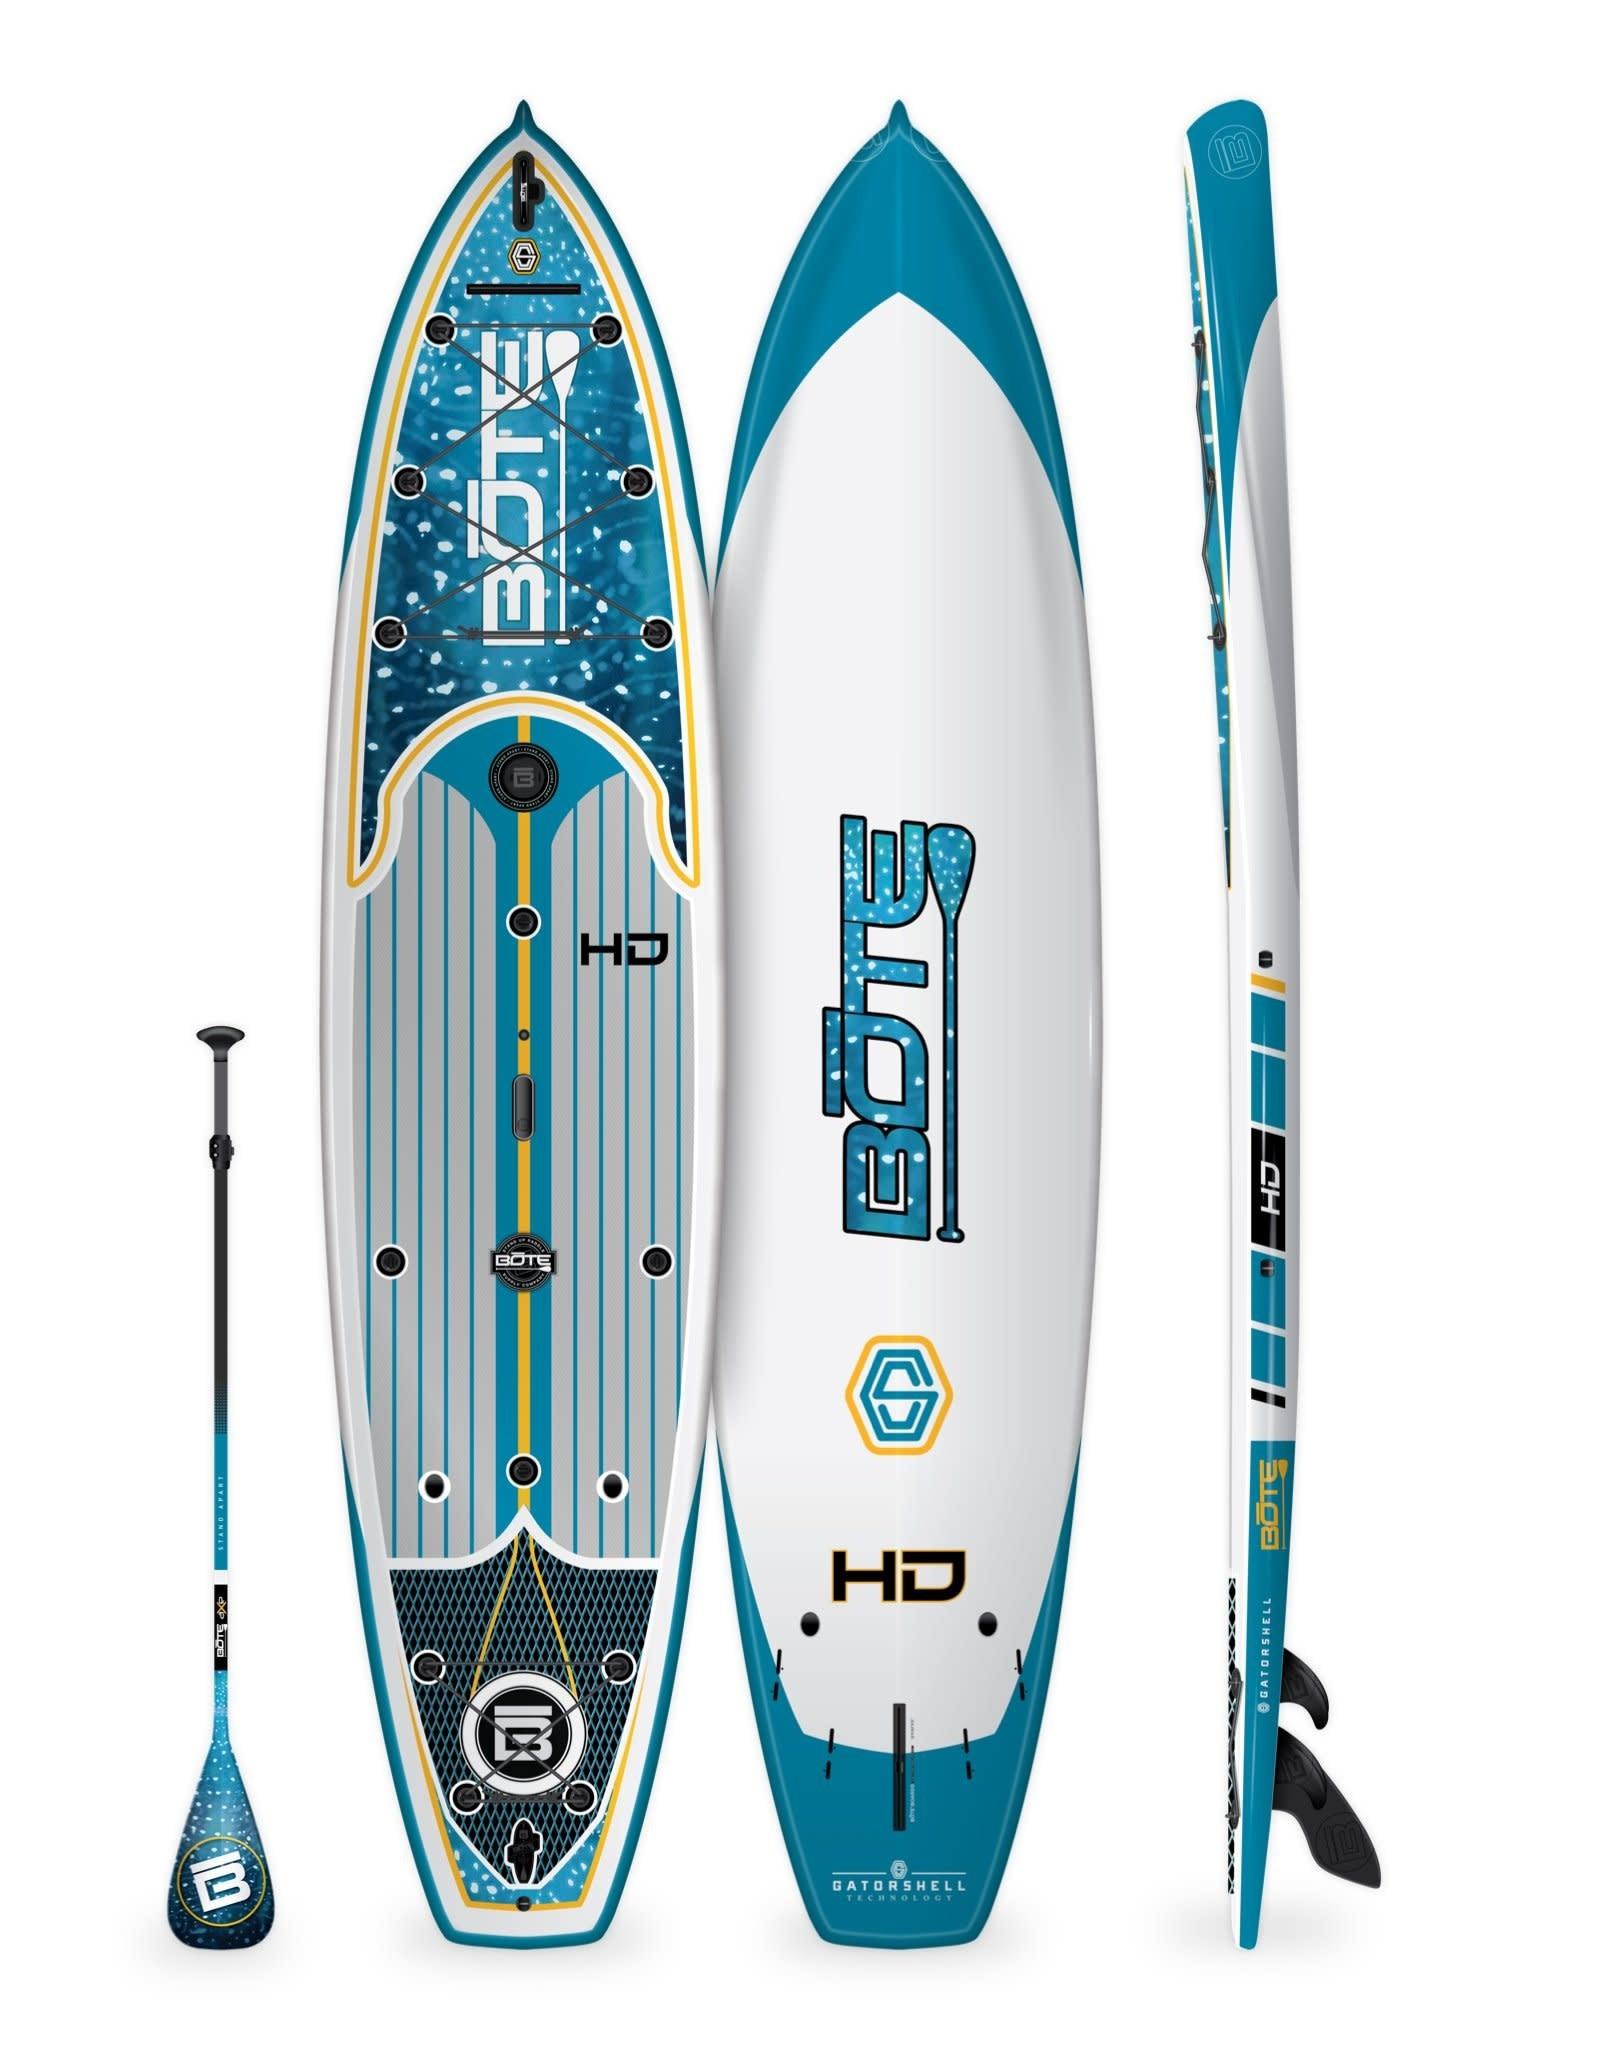 Bote 2021 BOTE 12'  HD GATORSHELL NATIVE WHALE SHARK